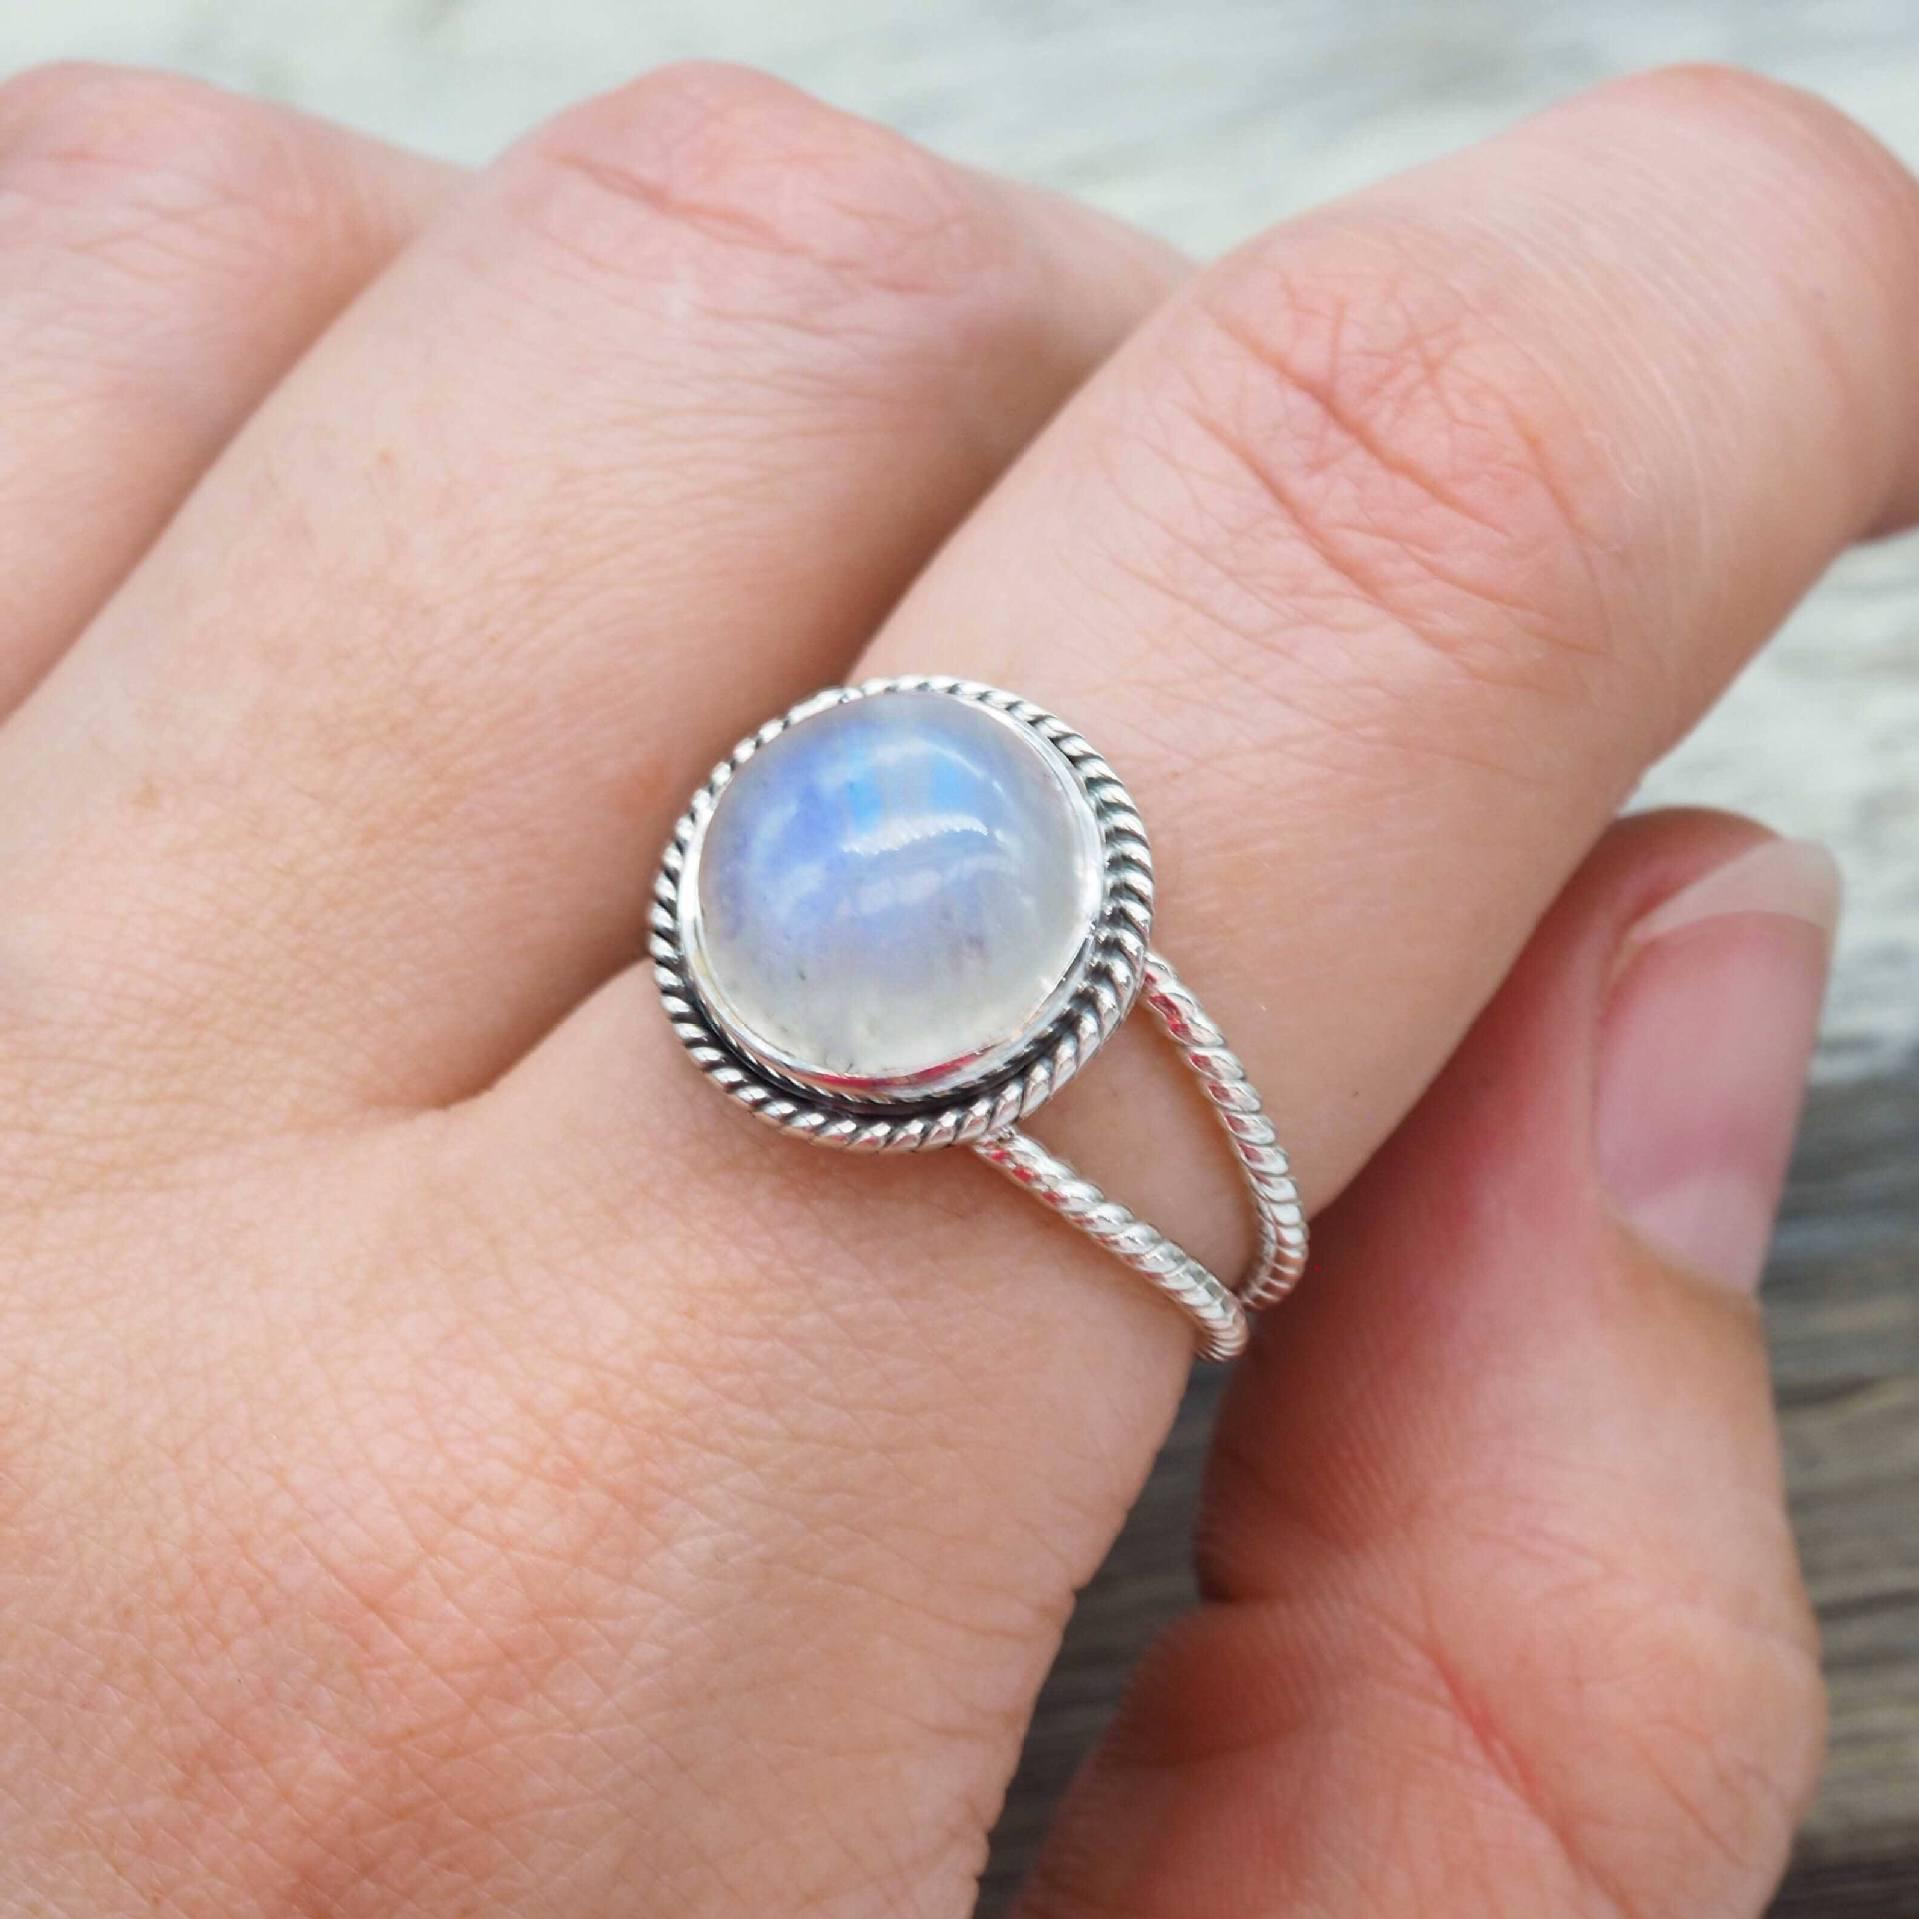 Piedra Lunar anillo tailandés plateado Color 925 Circular piedra lunar Anillos De boda bisutería turquesa Diamante Anillos De mujer